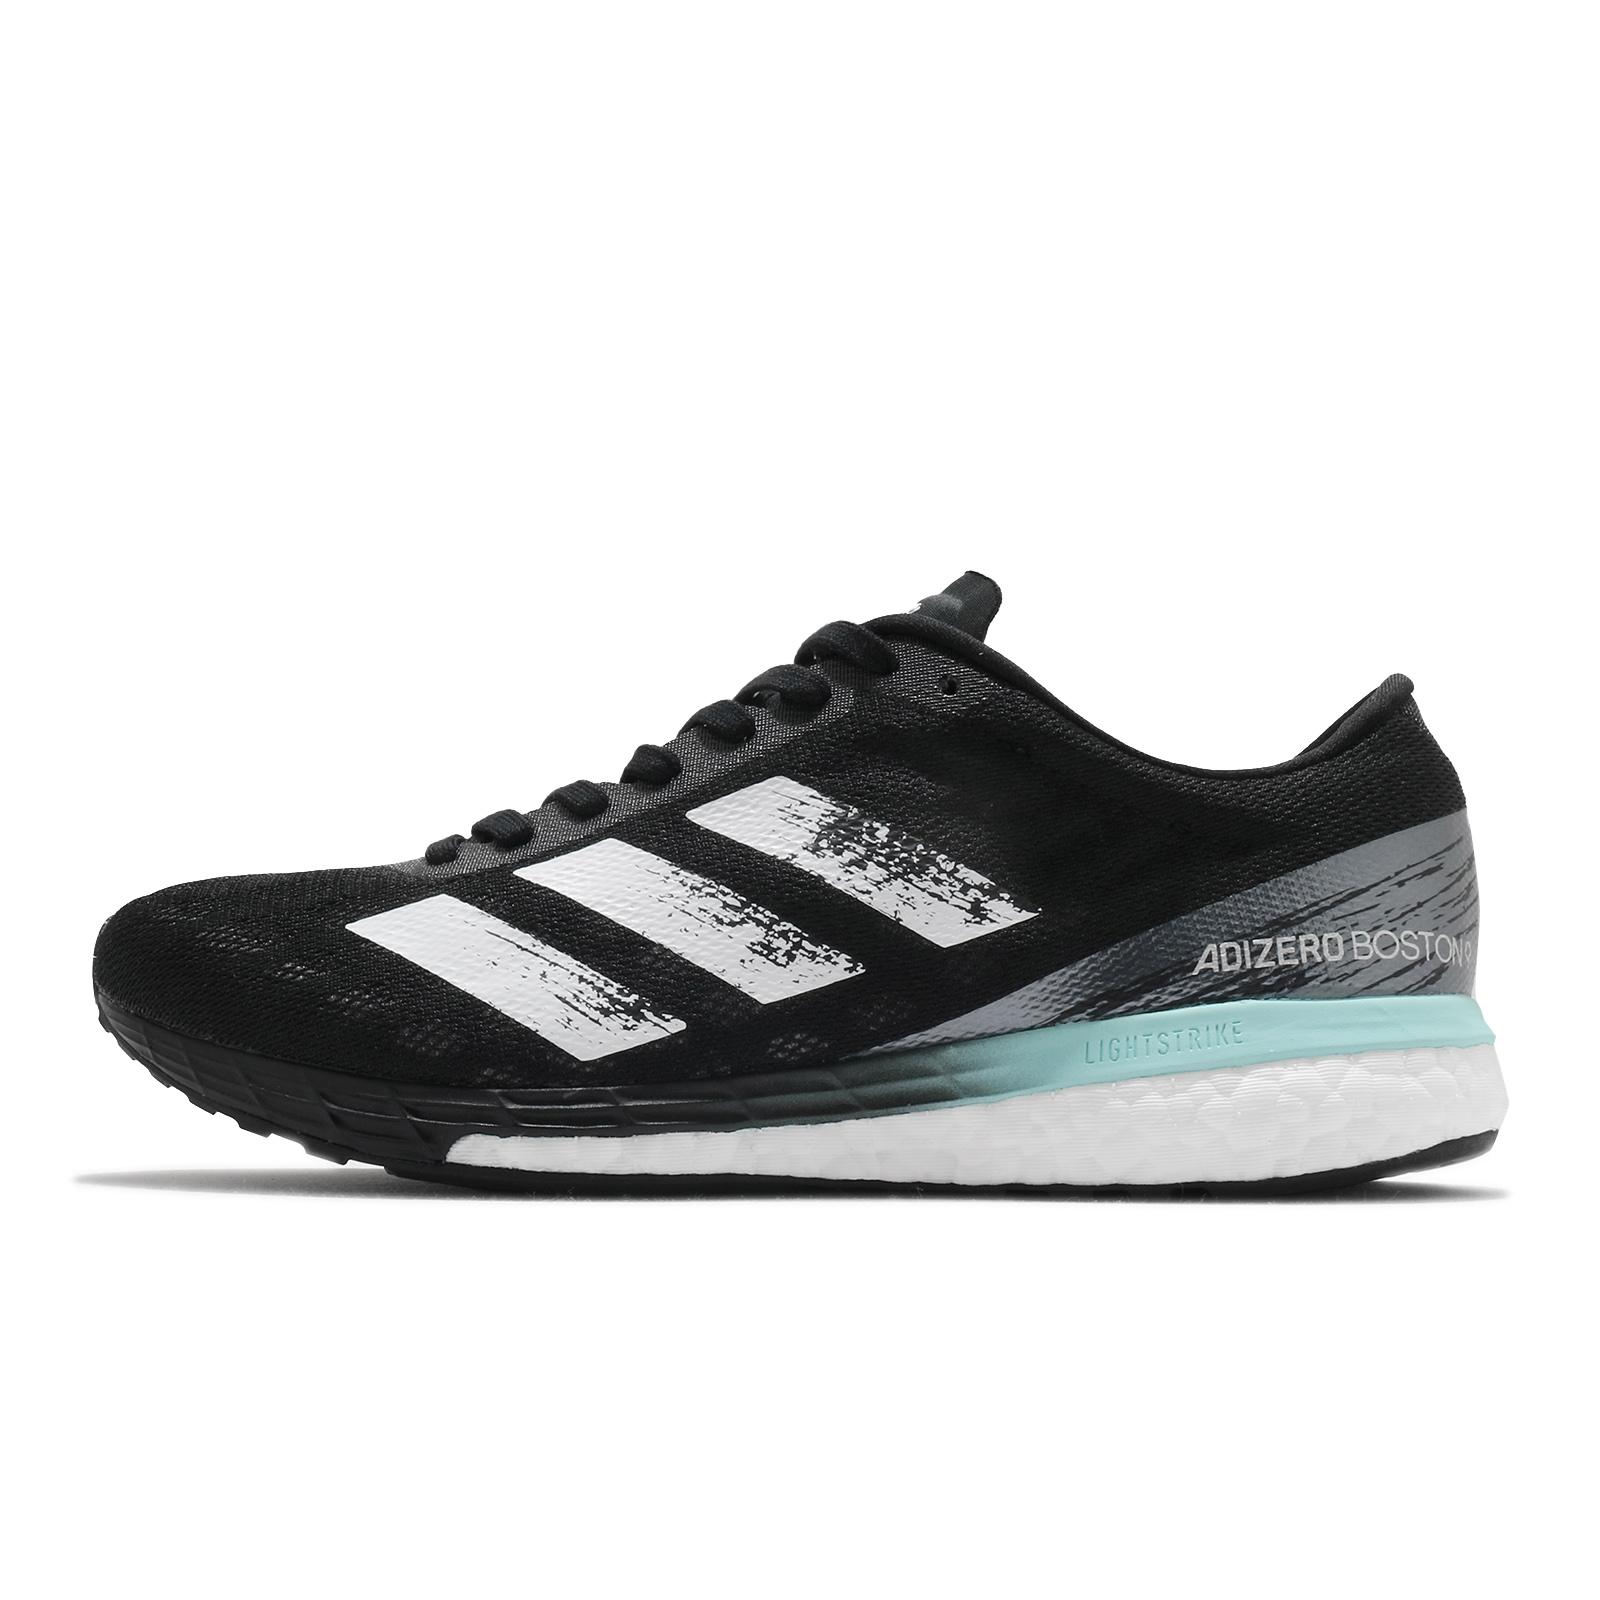 adidas 慢跑鞋 Adizero Boston 9 W 黑 白 輕量 速度型 女鞋 愛迪達 【ACS】 FY0342